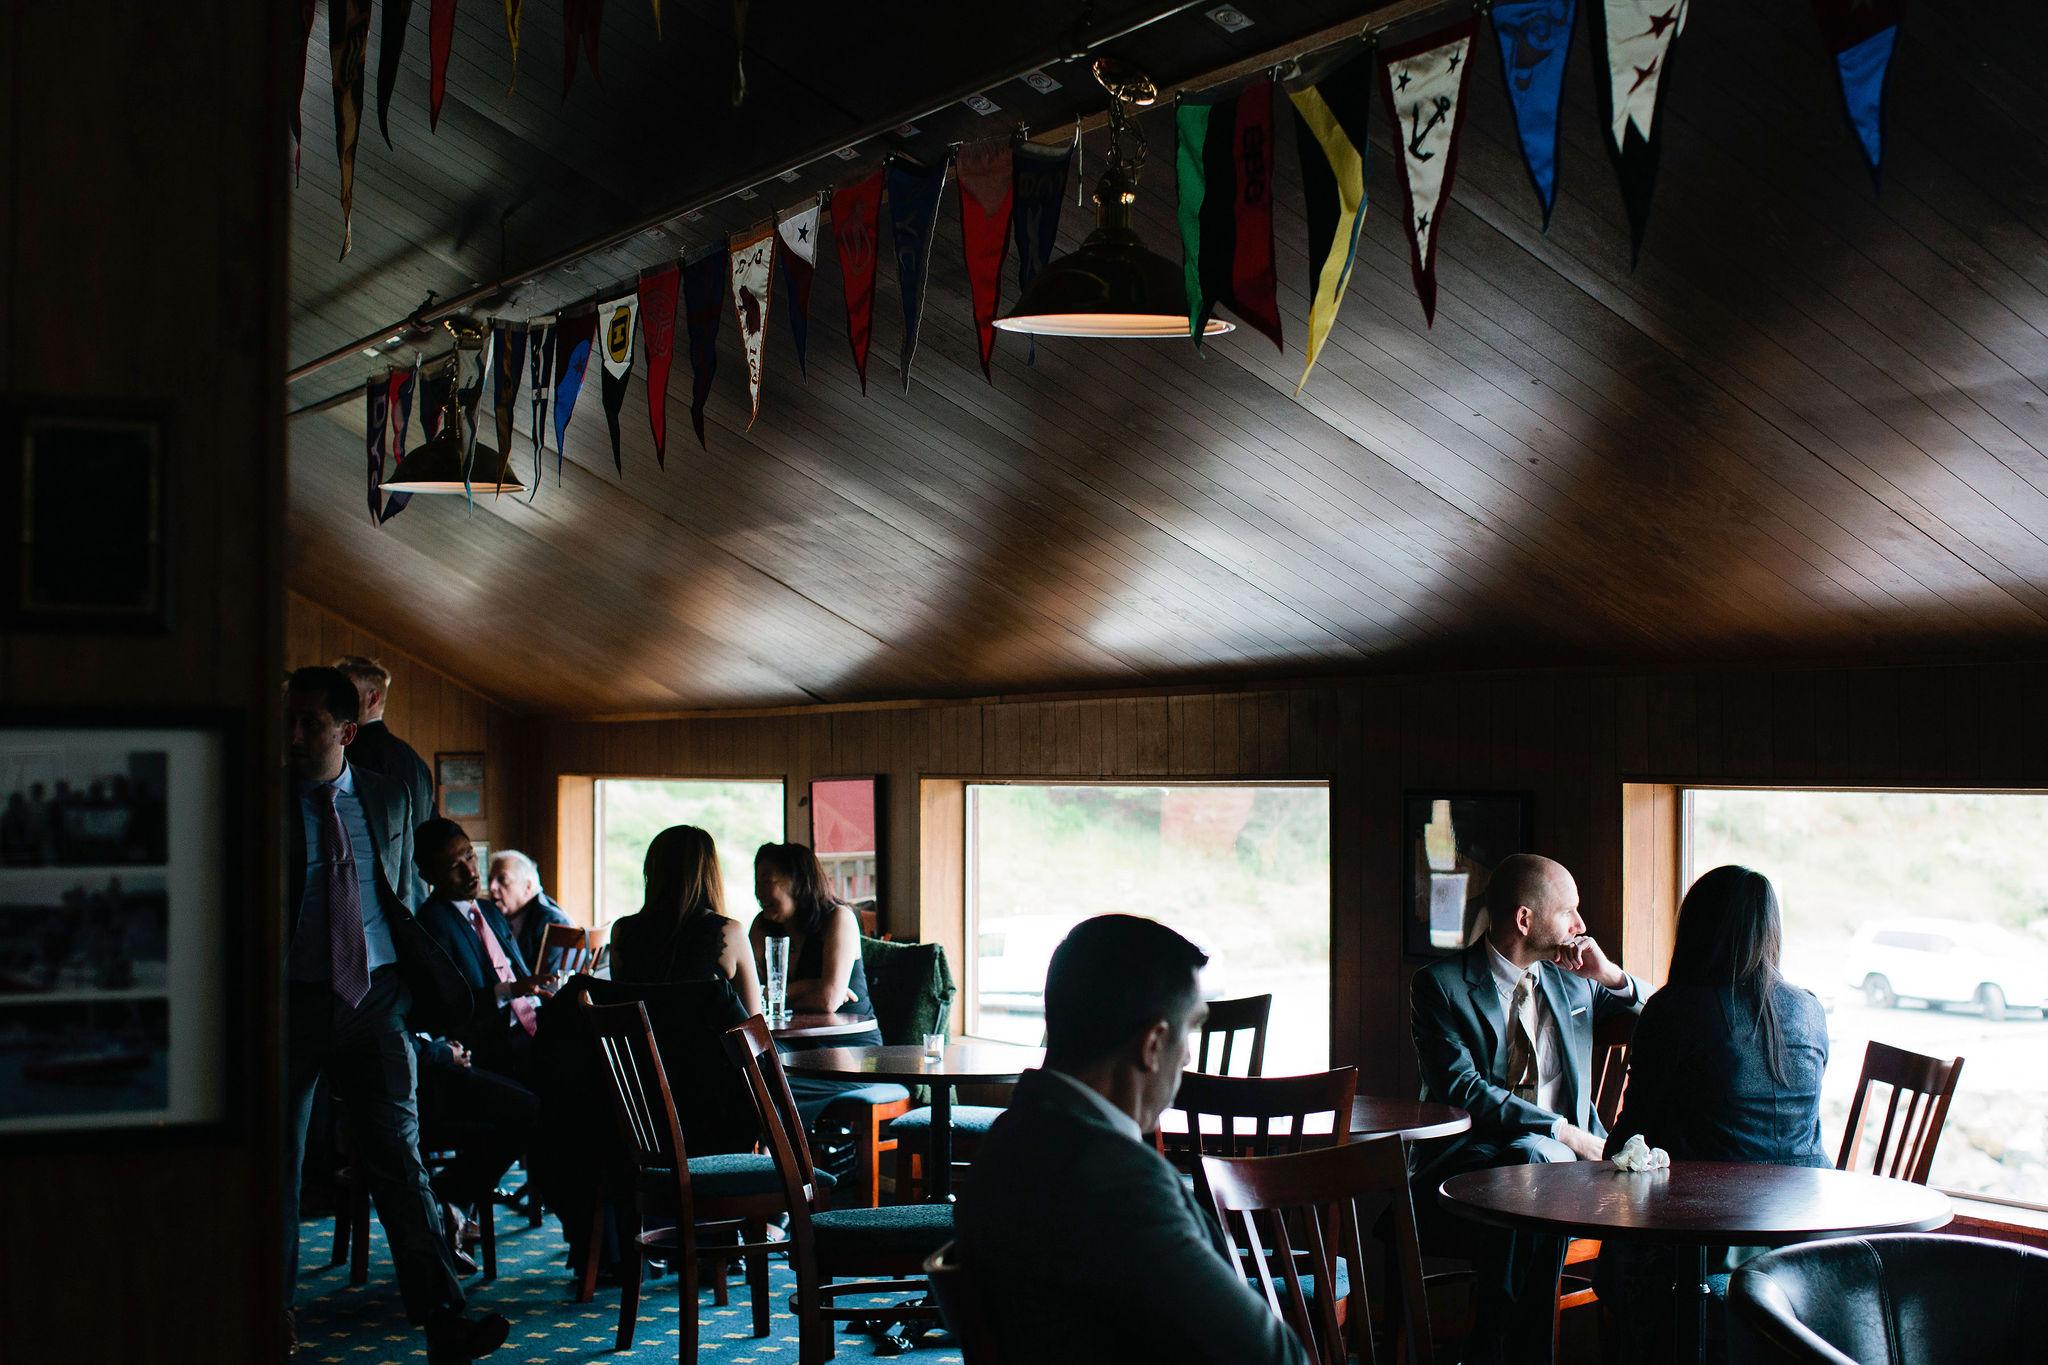 Presidio-Yacht-Club-Wedding-071.JPG